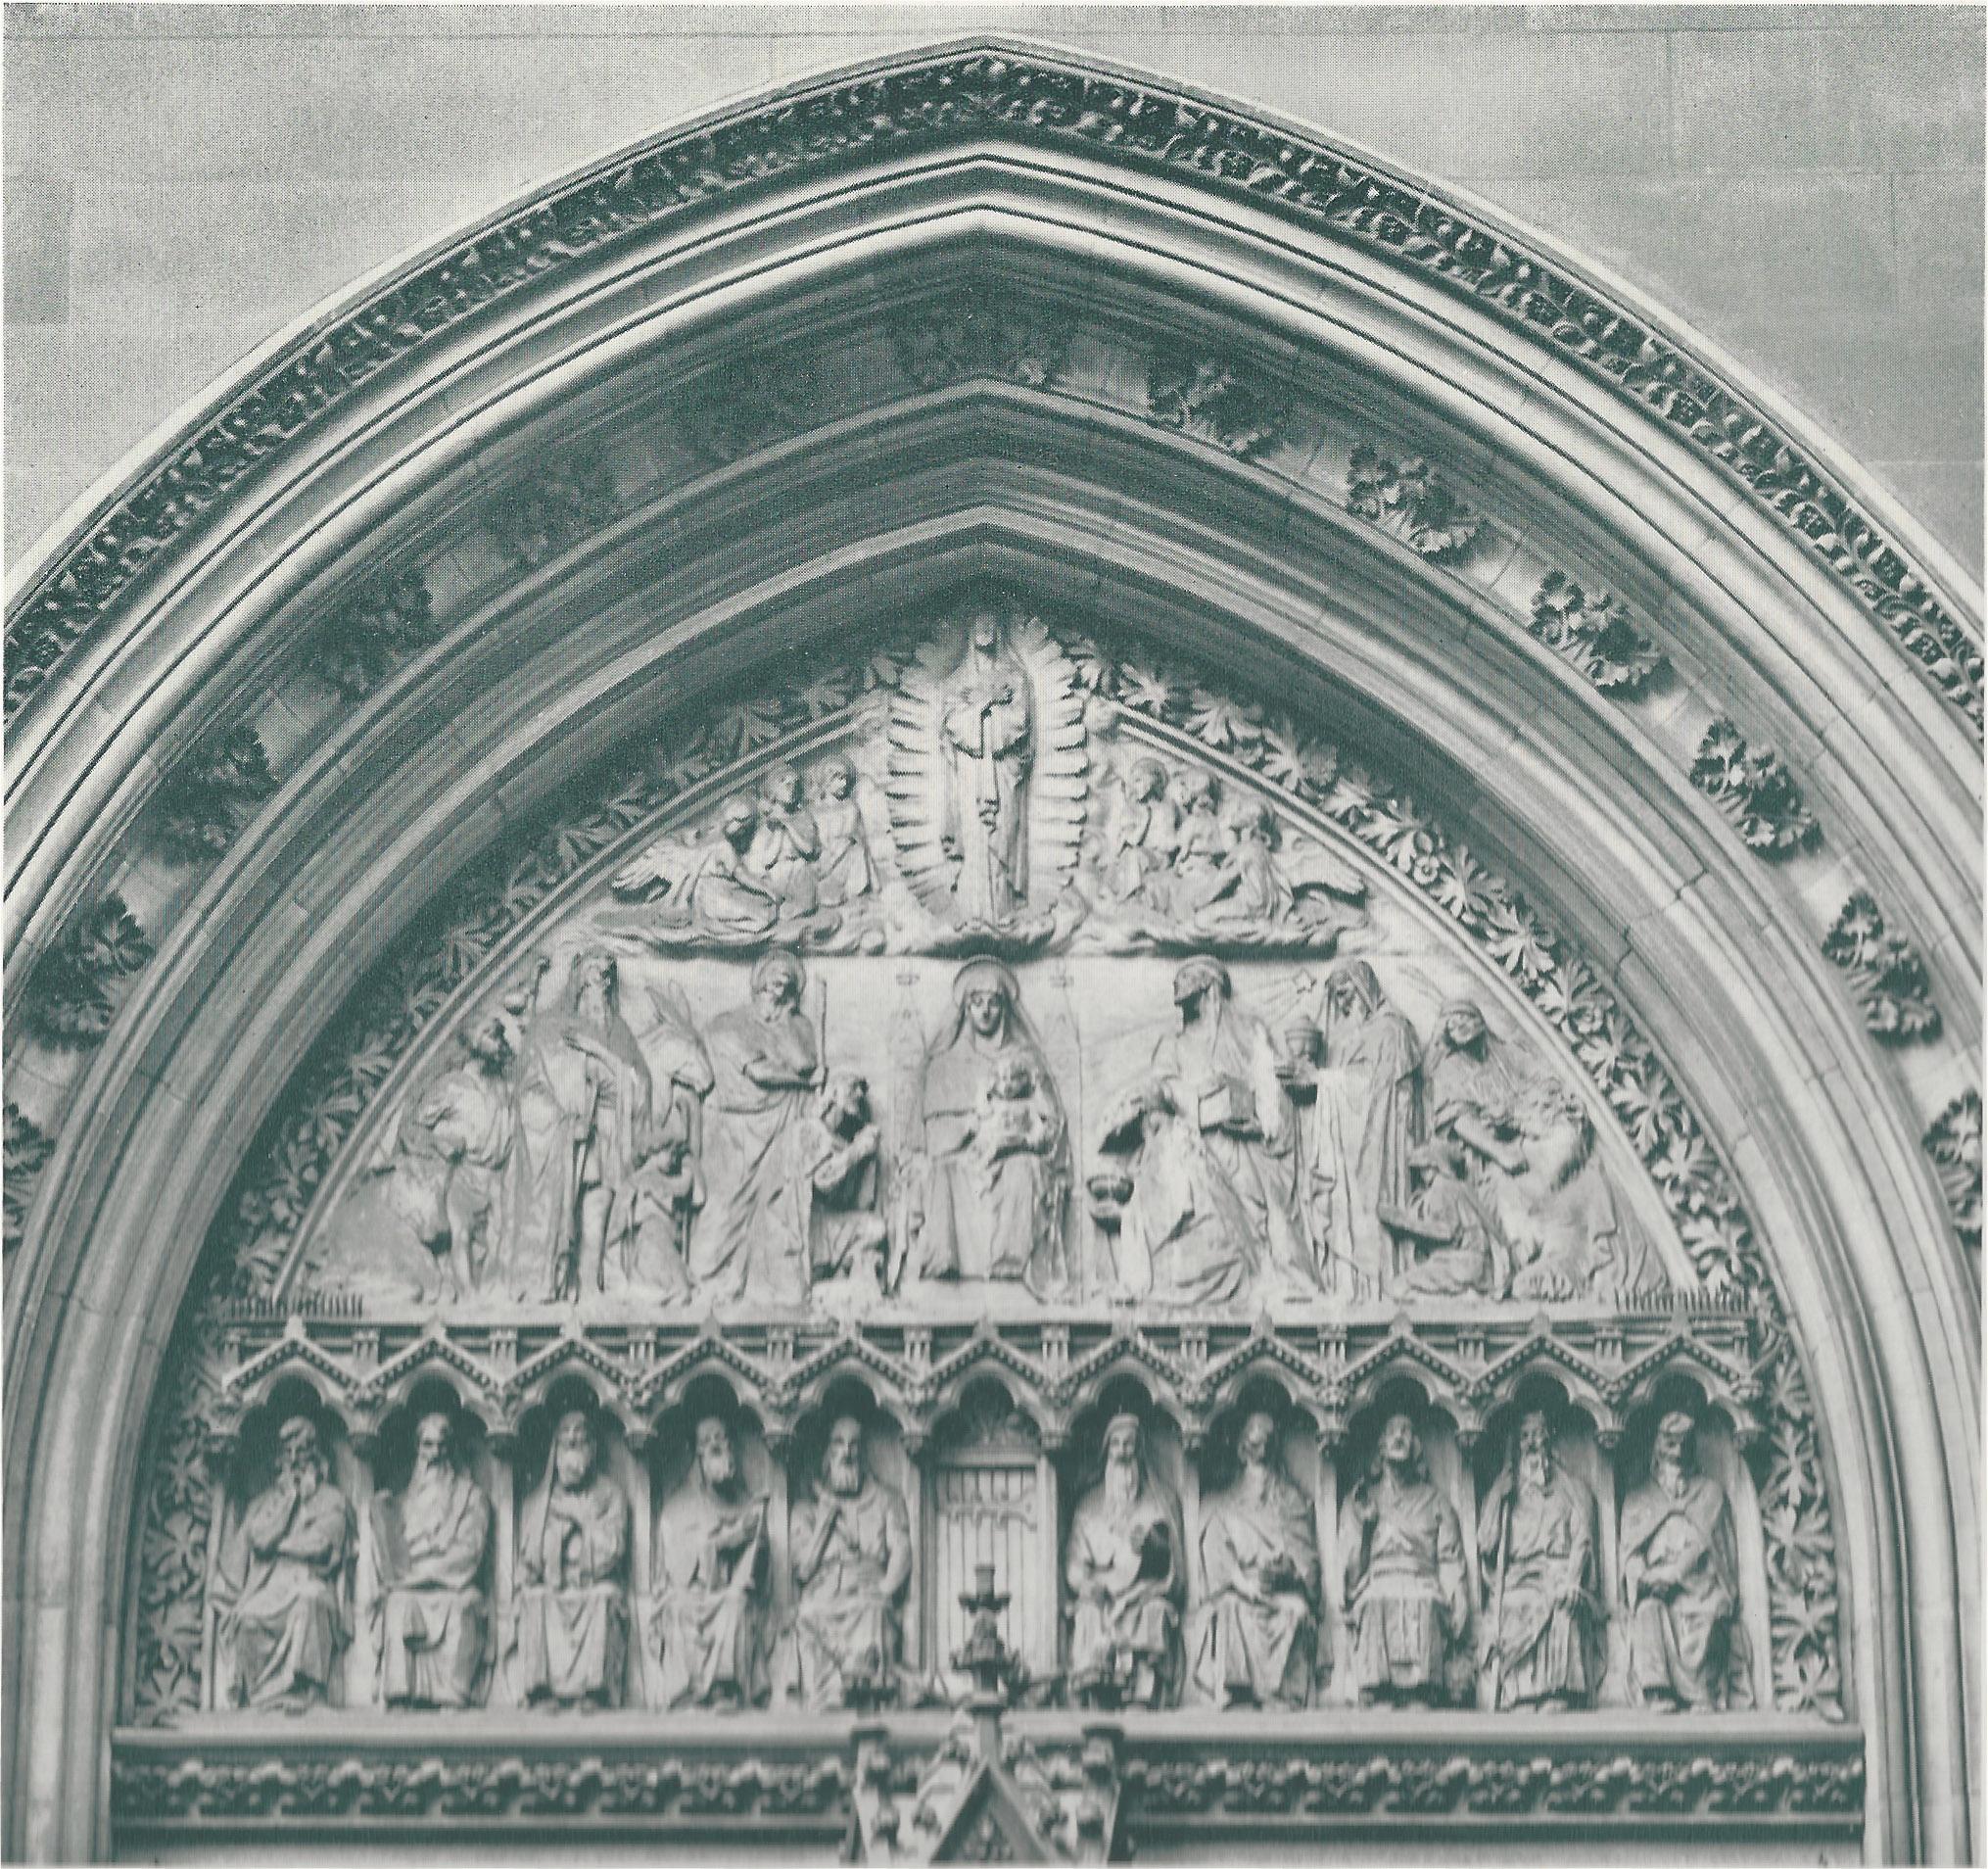 The tympanum over the door of Saint Mary's - 1950s